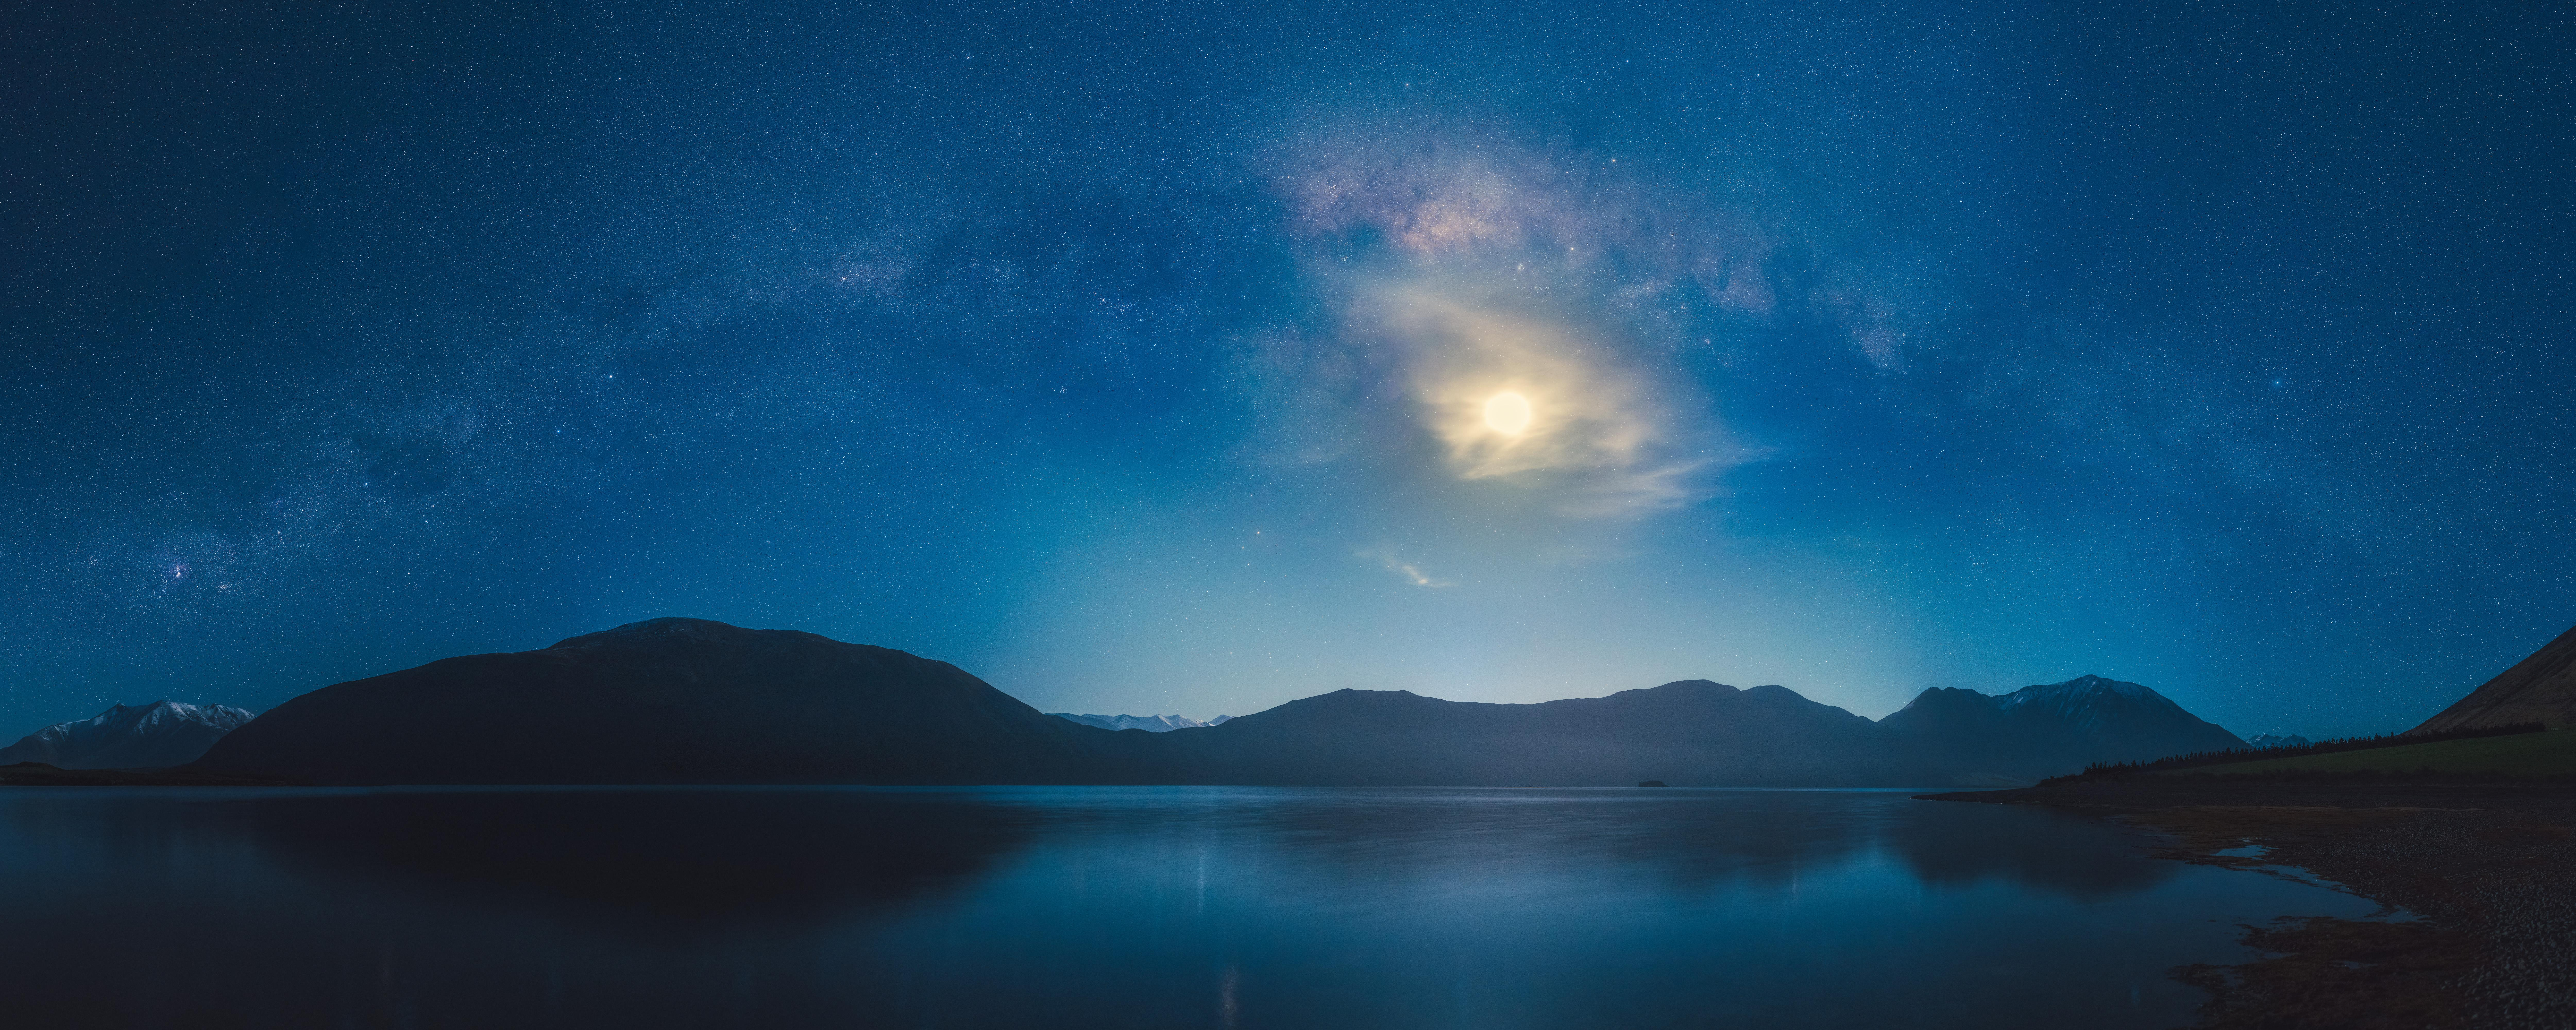 General 10000x4000 mountains lake Moon night night sky long exposure